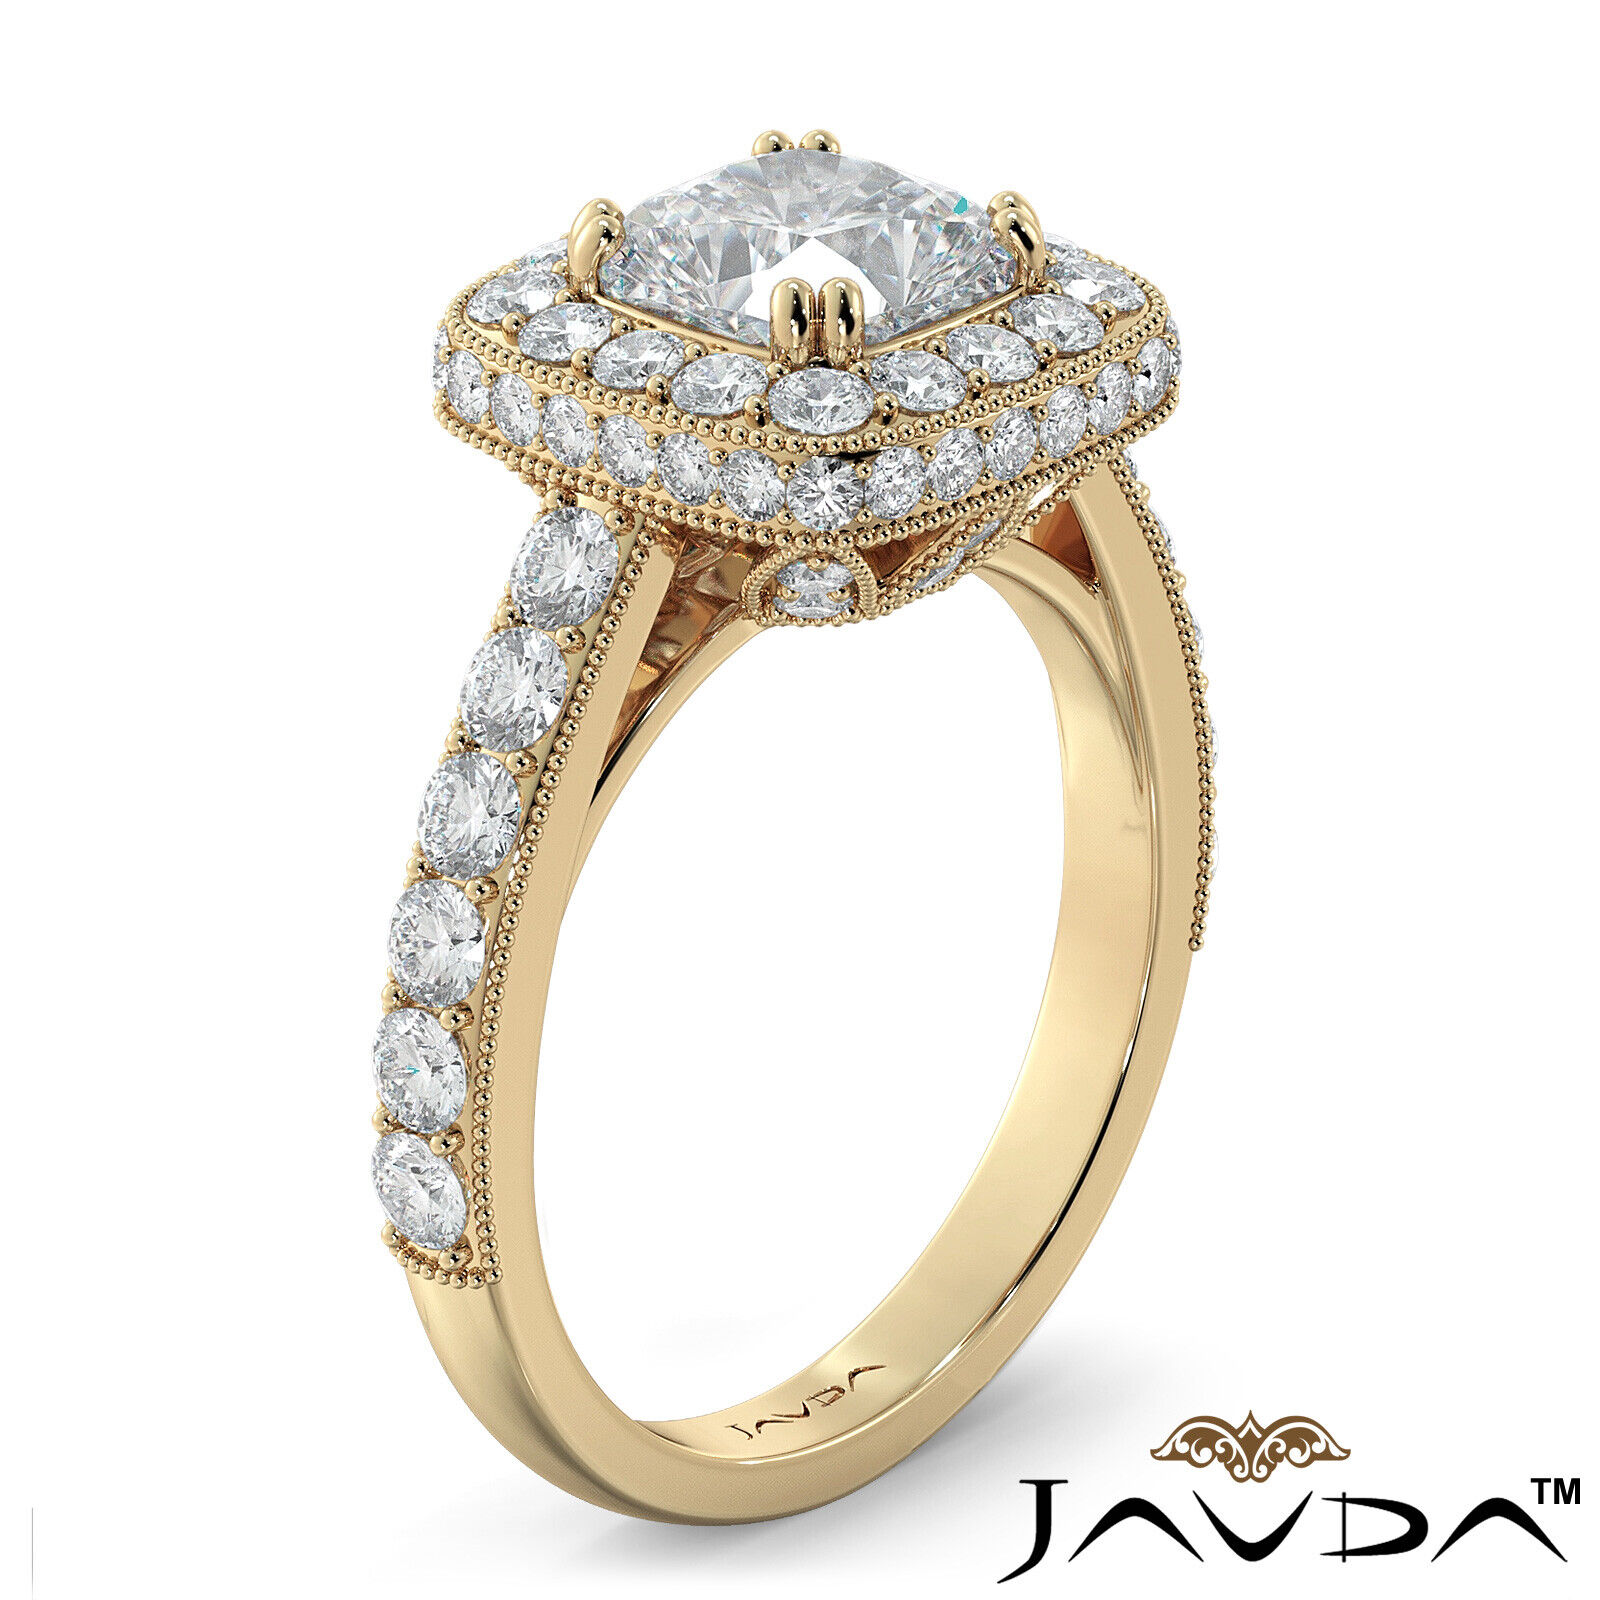 2ctw Milgrain Halo Floral Basket Cushion Diamond Engagement Ring GIA H-VS2 Gold 8